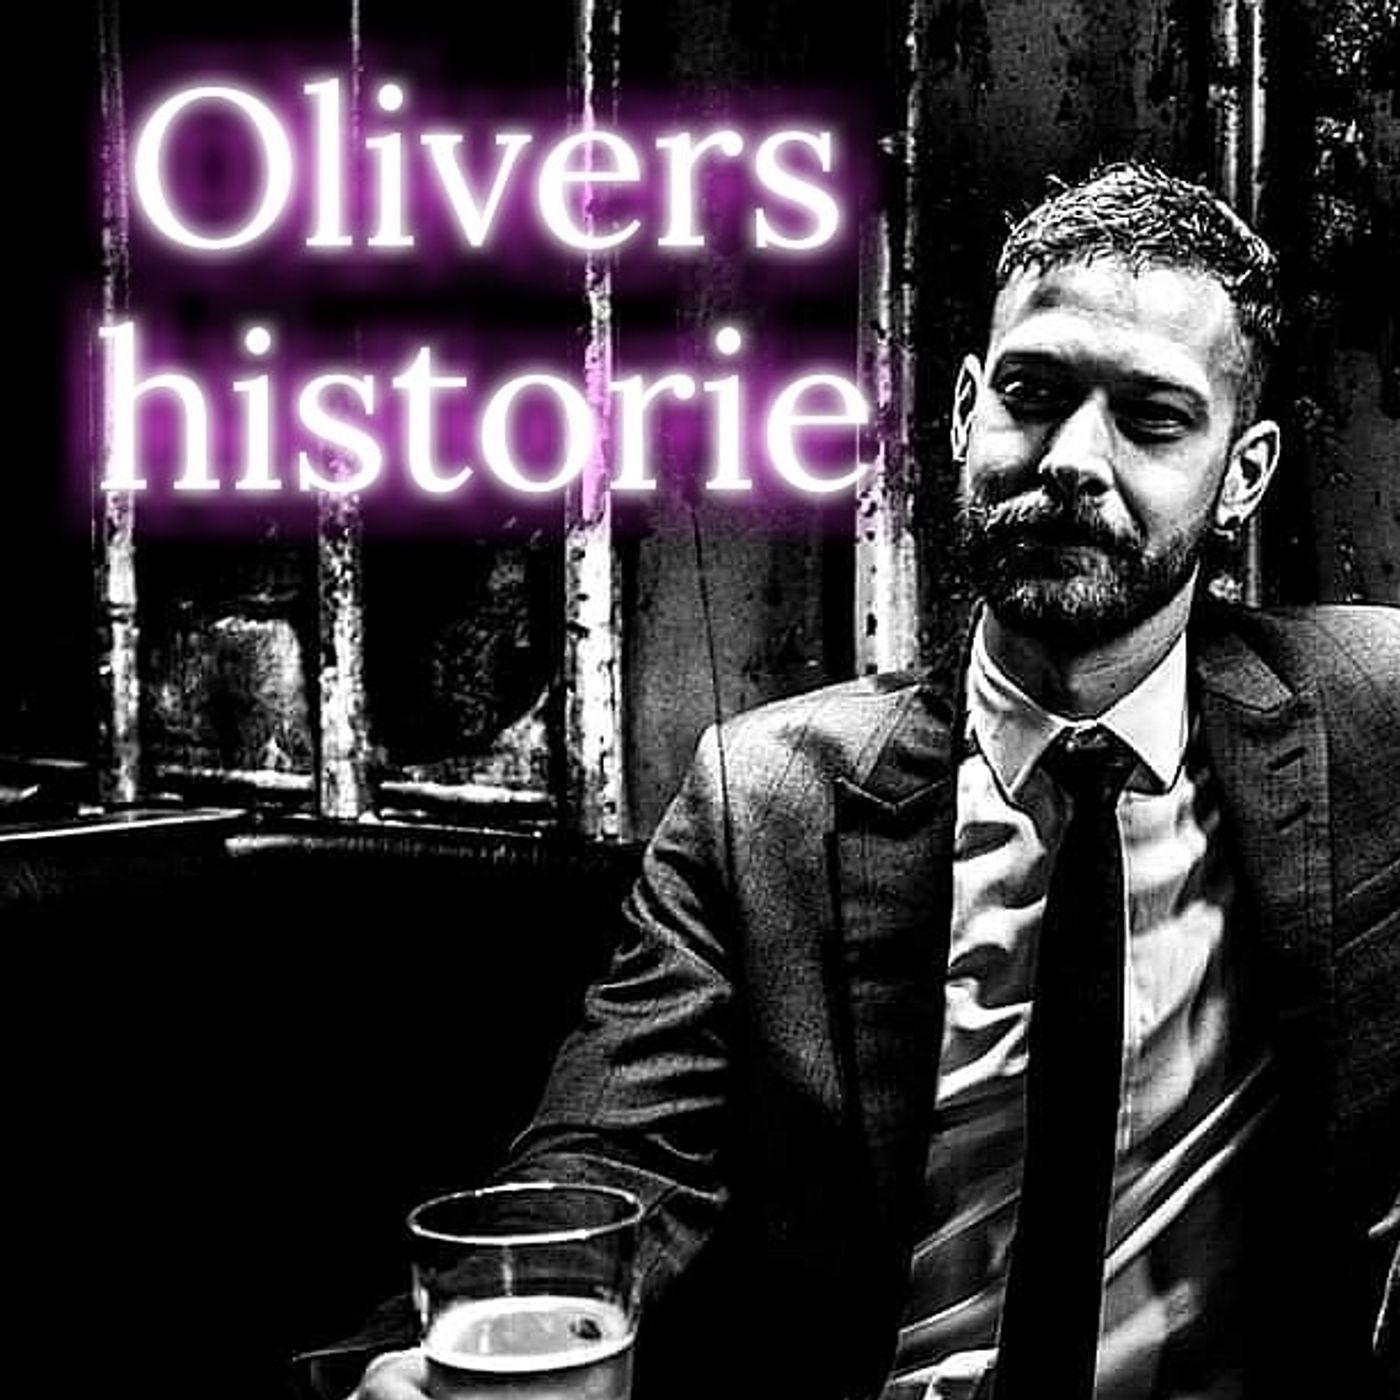 #43: Olivers historie.